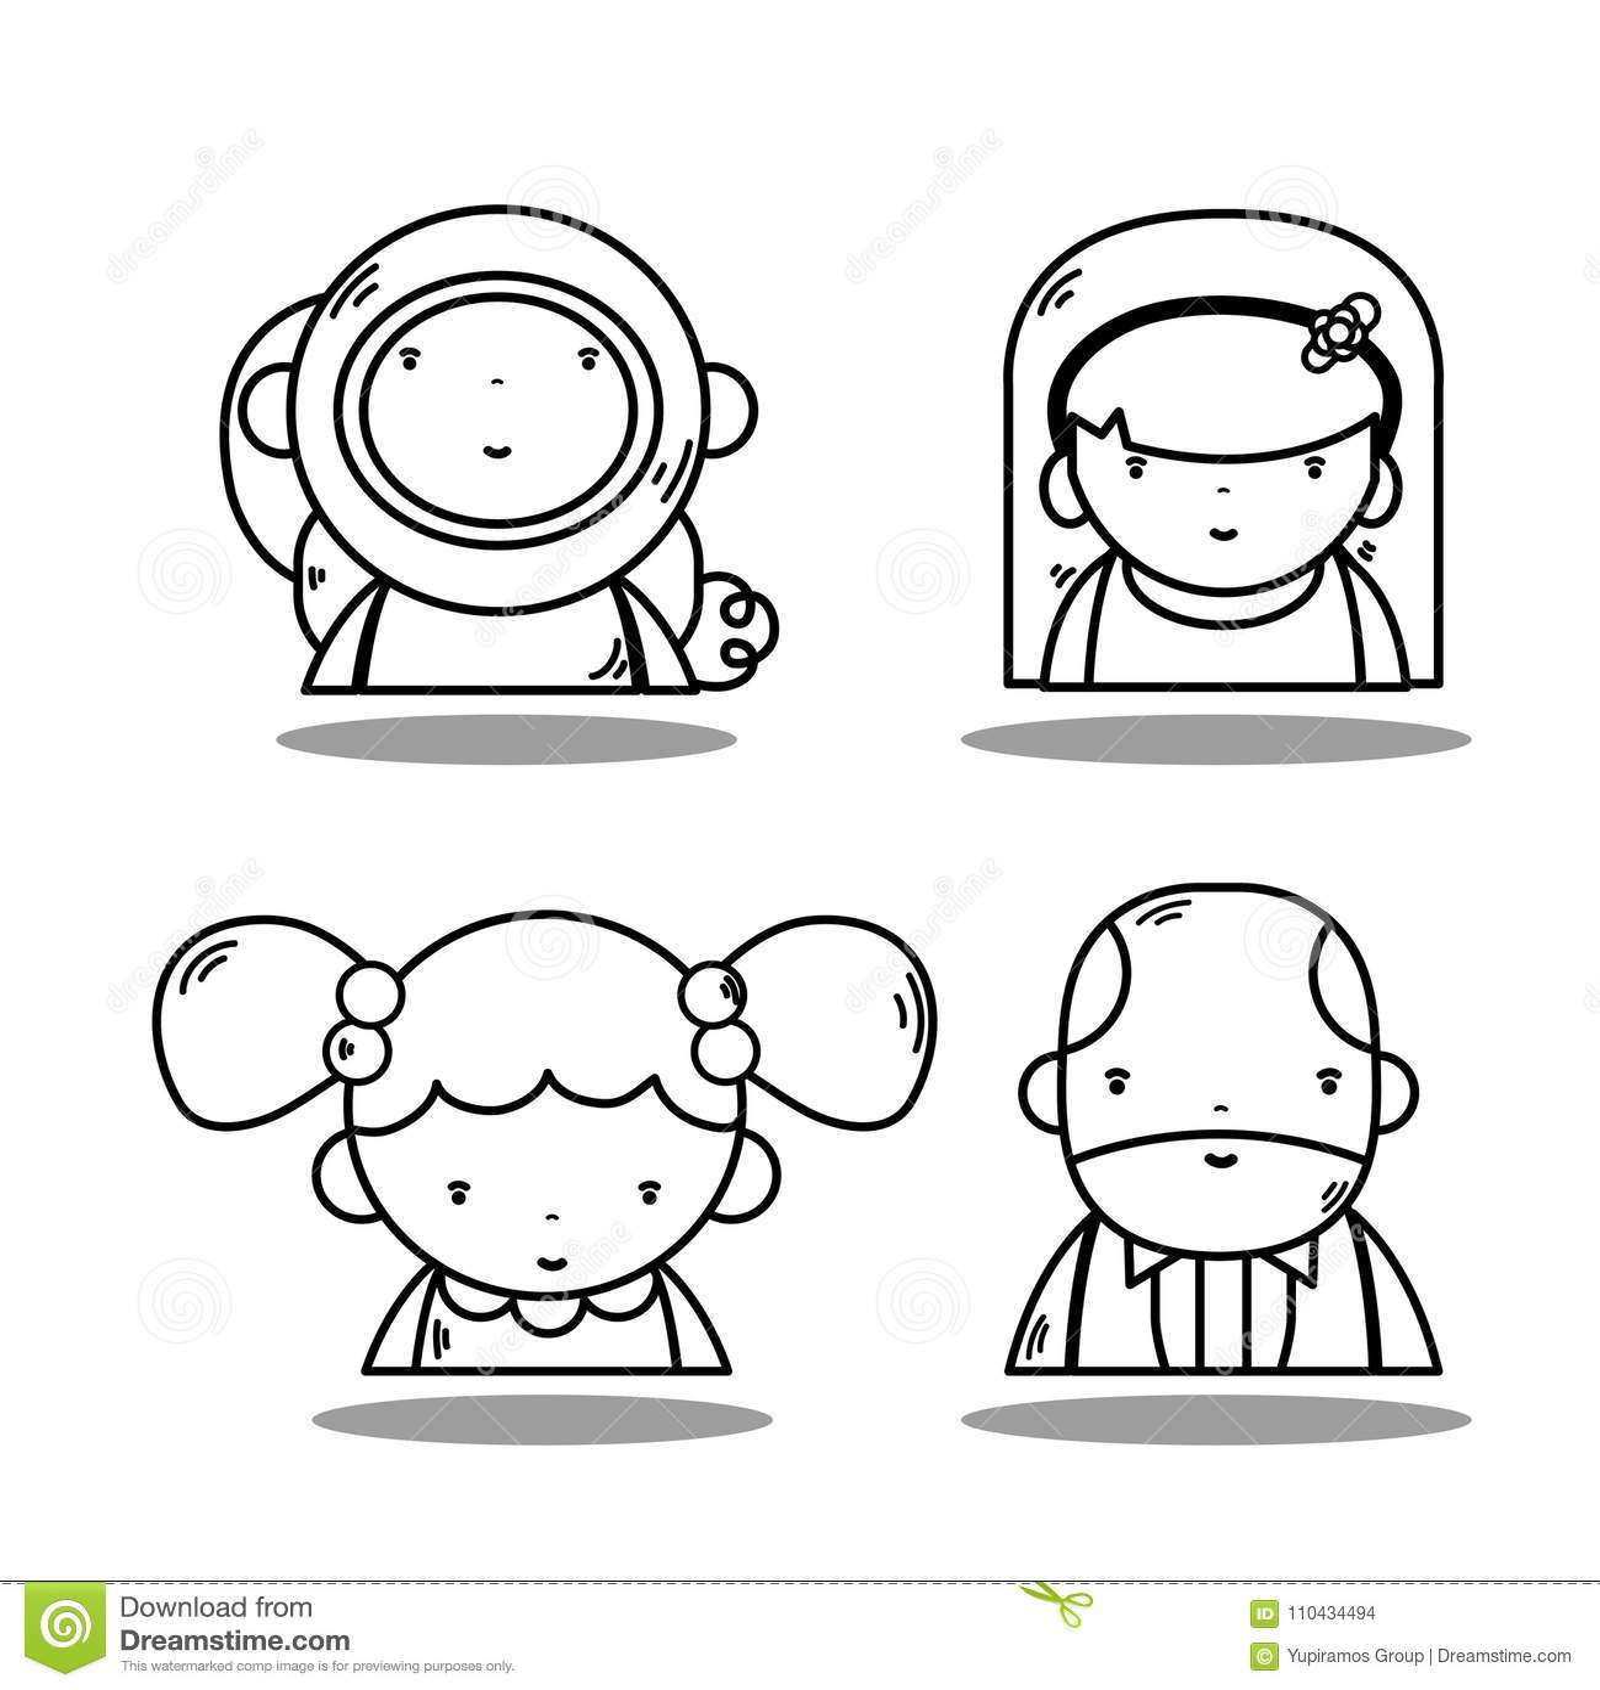 Avatar kawaiiastronaut met zakenman en vrouwen